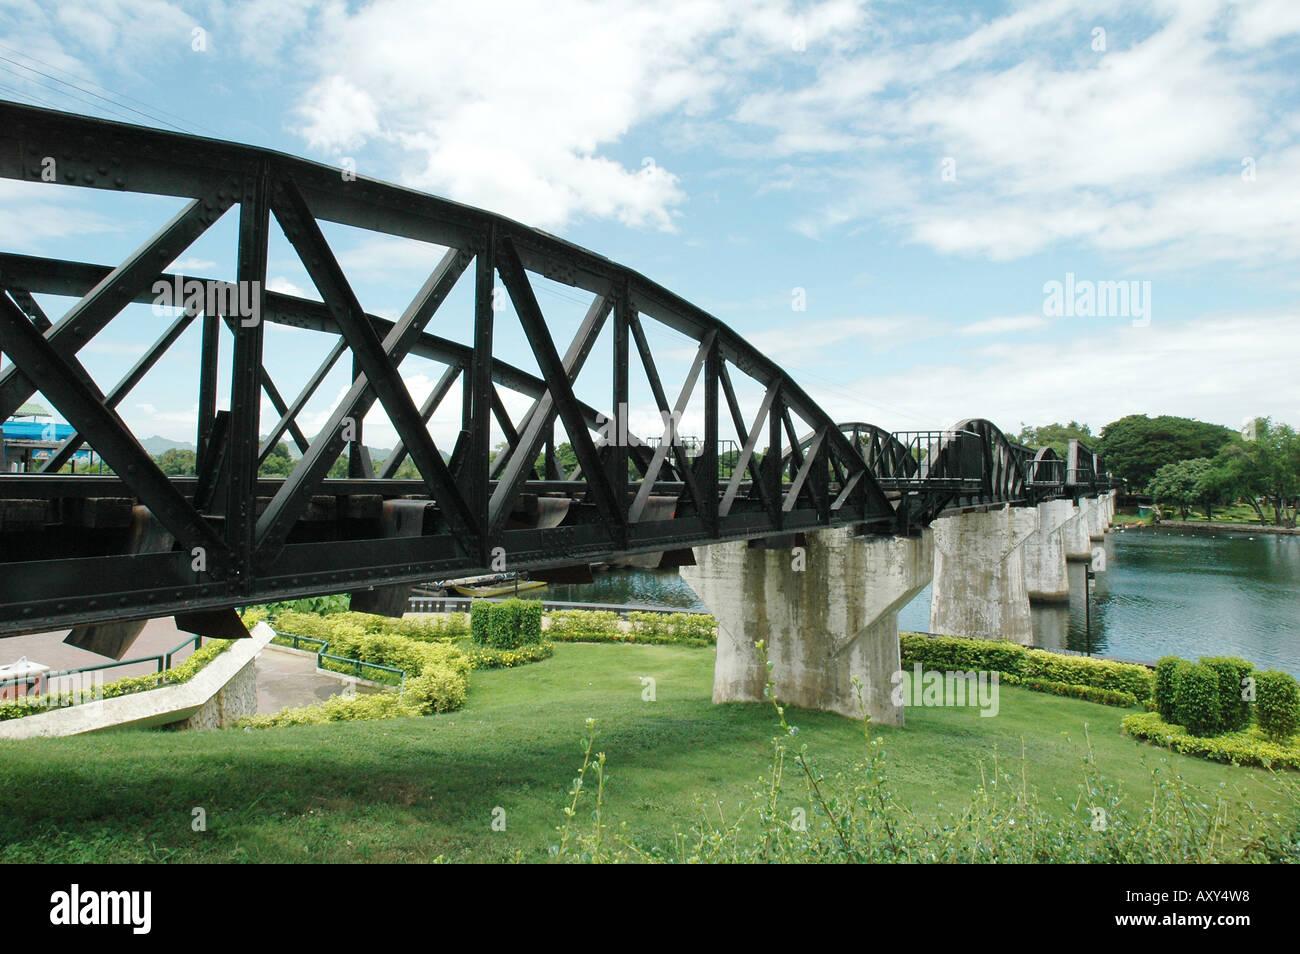 Bridge over the River Kwai, Kanchanaburi, Thailand. - Stock Image